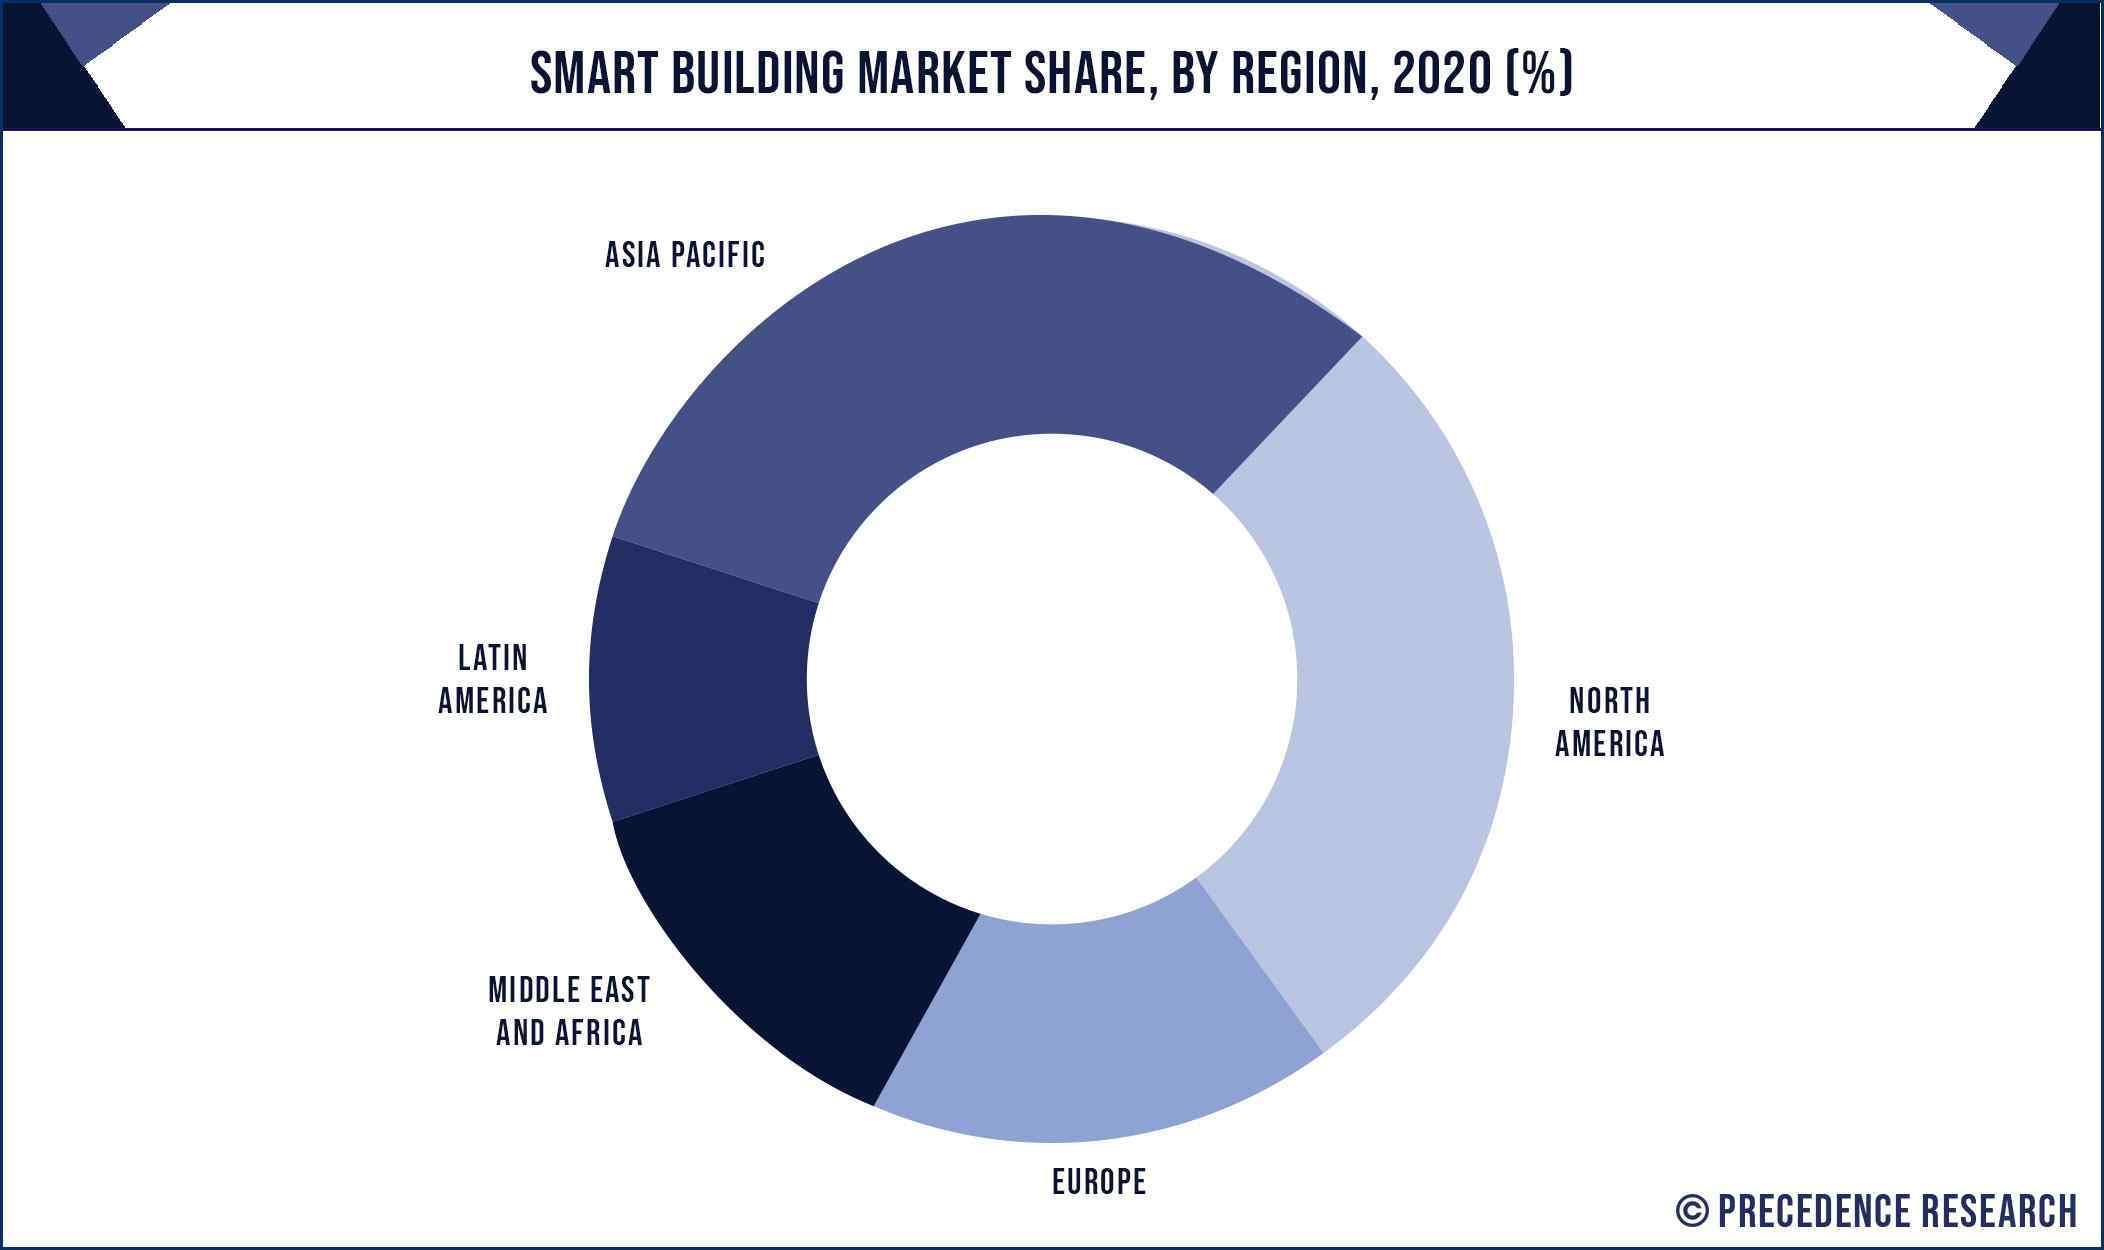 Smart Building Market Share, By Region, 2020 (%)